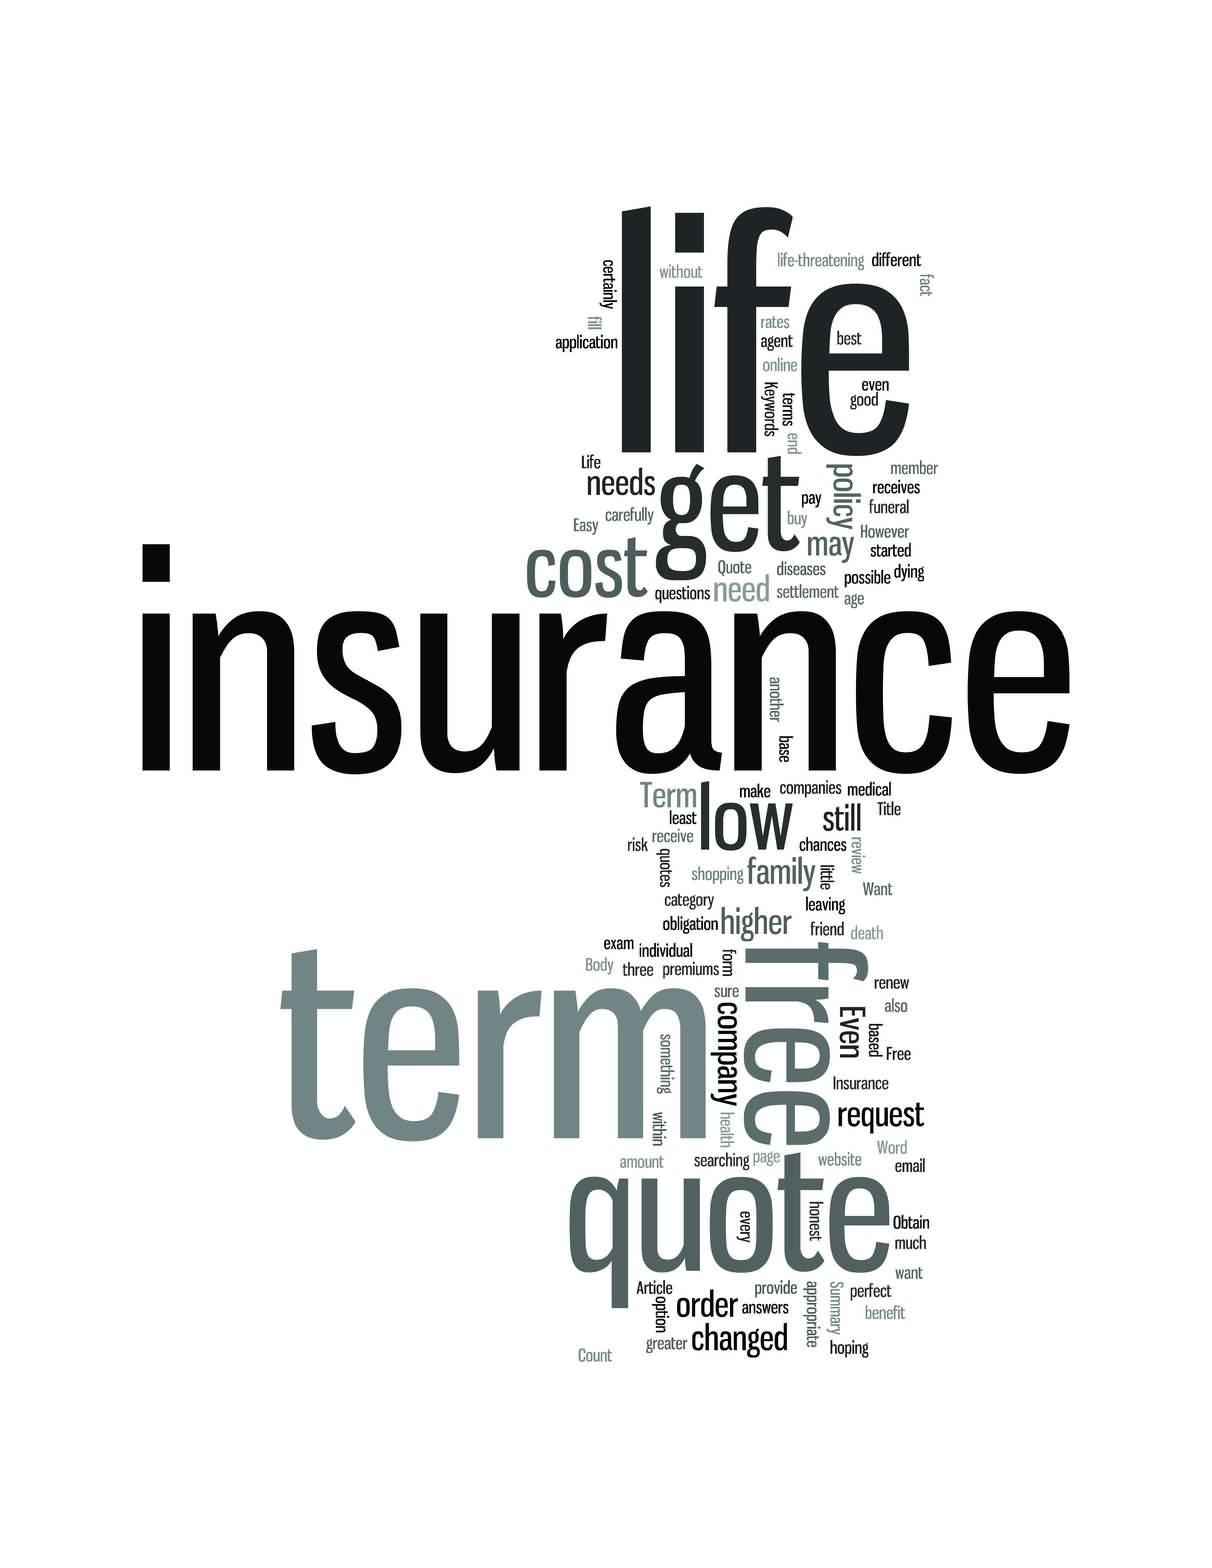 Life Insurance Sayings Quotes 20 Diabetes Life Insurance Quotes And Sayings  Quotesbae